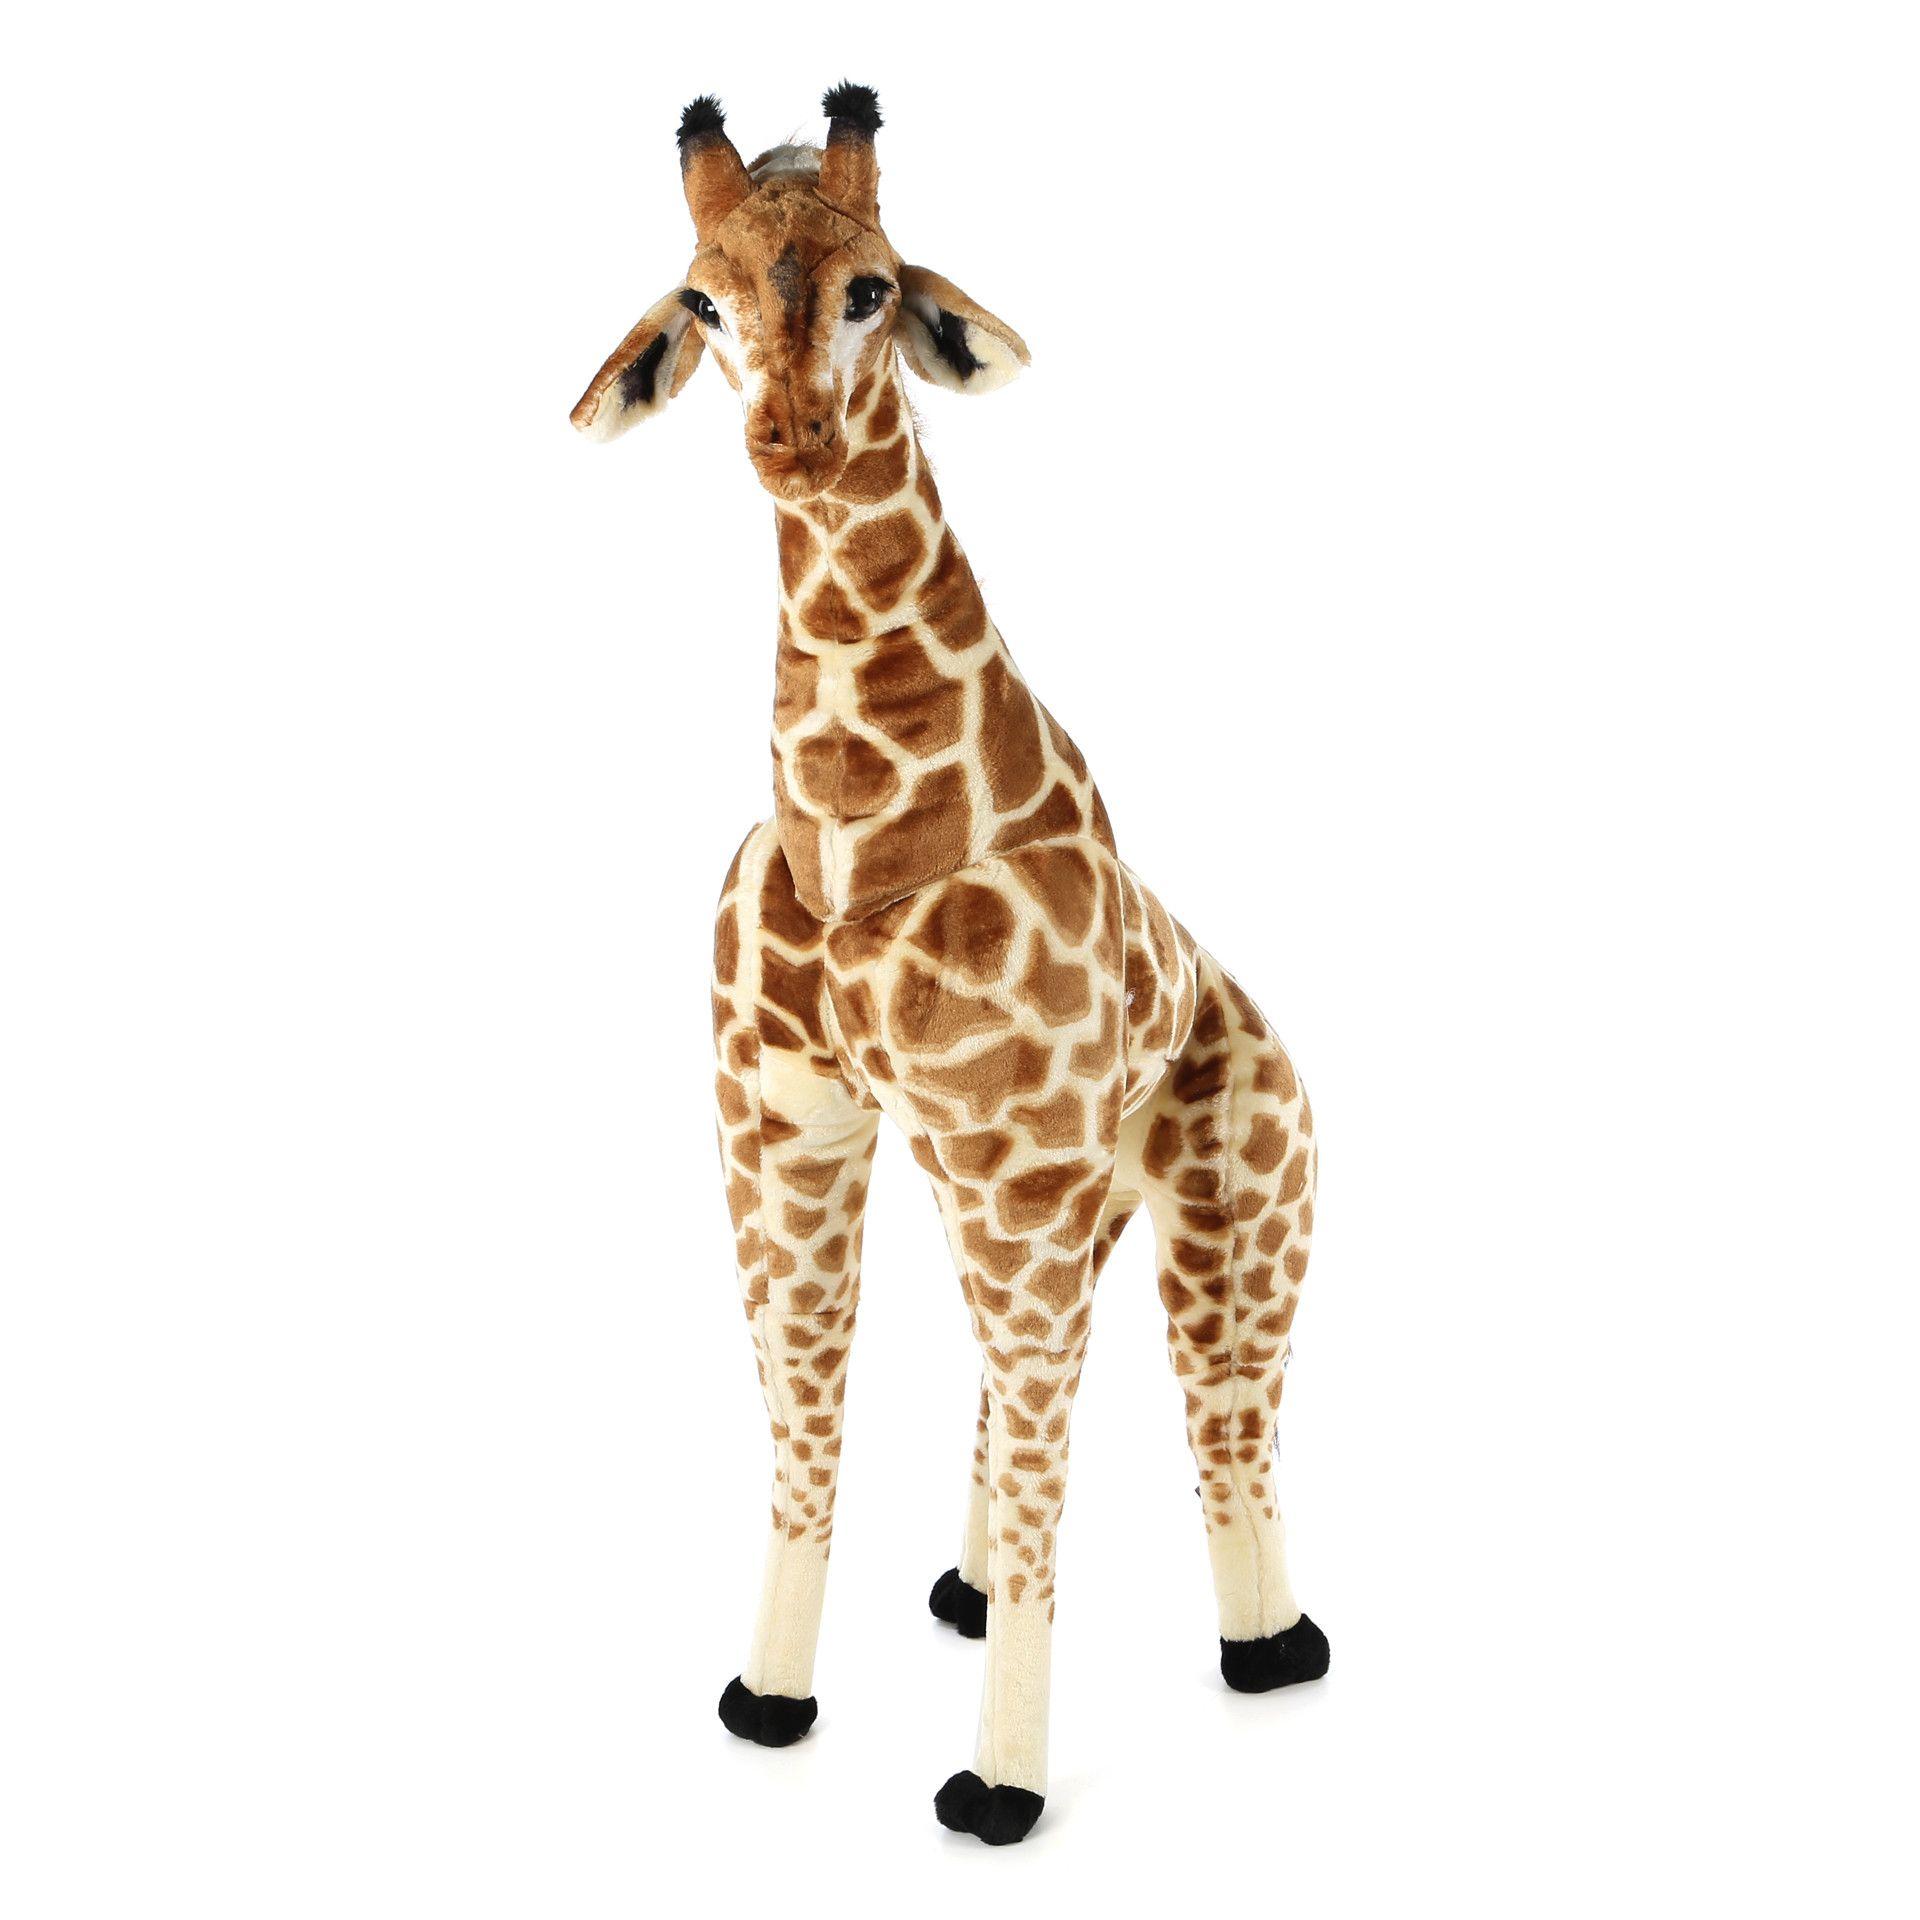 Melissa And Doug Large Giraffe Stuffed Animal Plush Toy Overall Height Top To Bottom Giraffe Stuffed Animal Large Giraffe Stuffed Animal Animal Plush Toys [ 1920 x 1920 Pixel ]